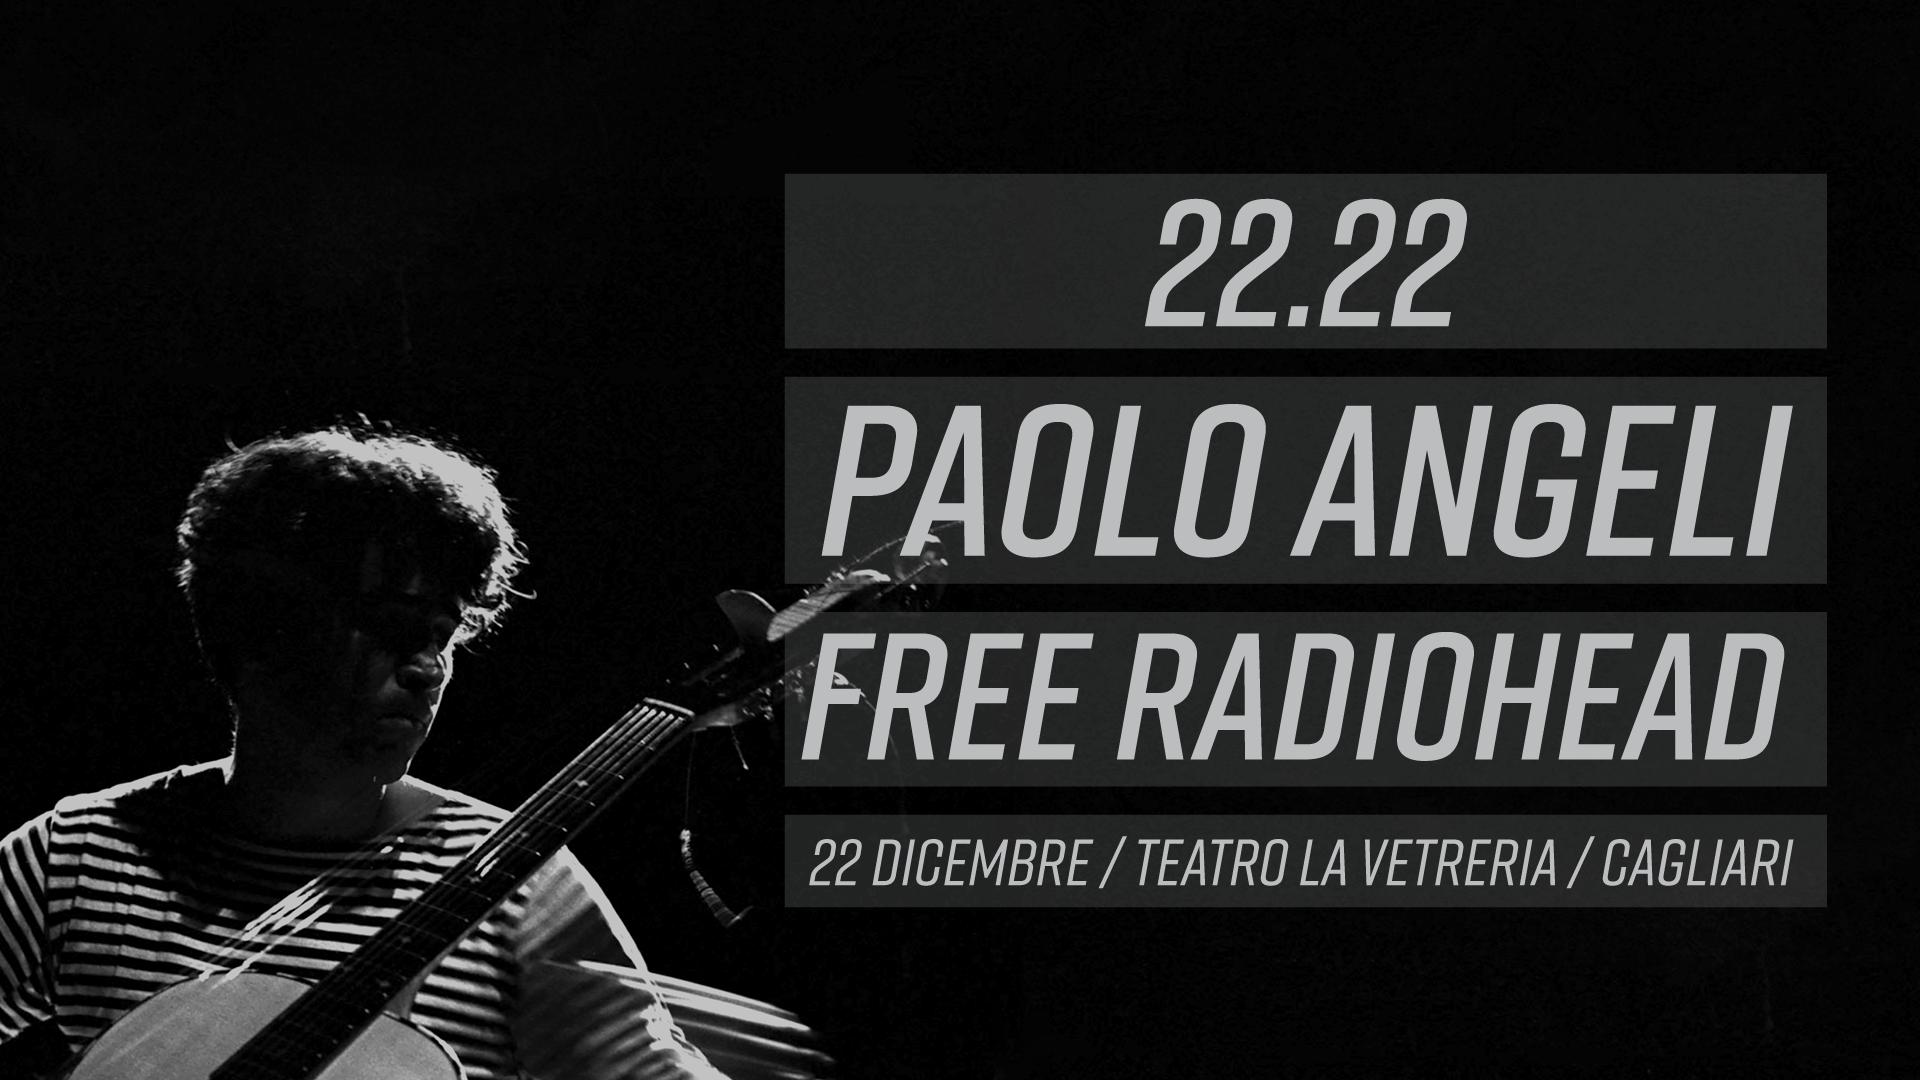 PAOLO ANGELI live